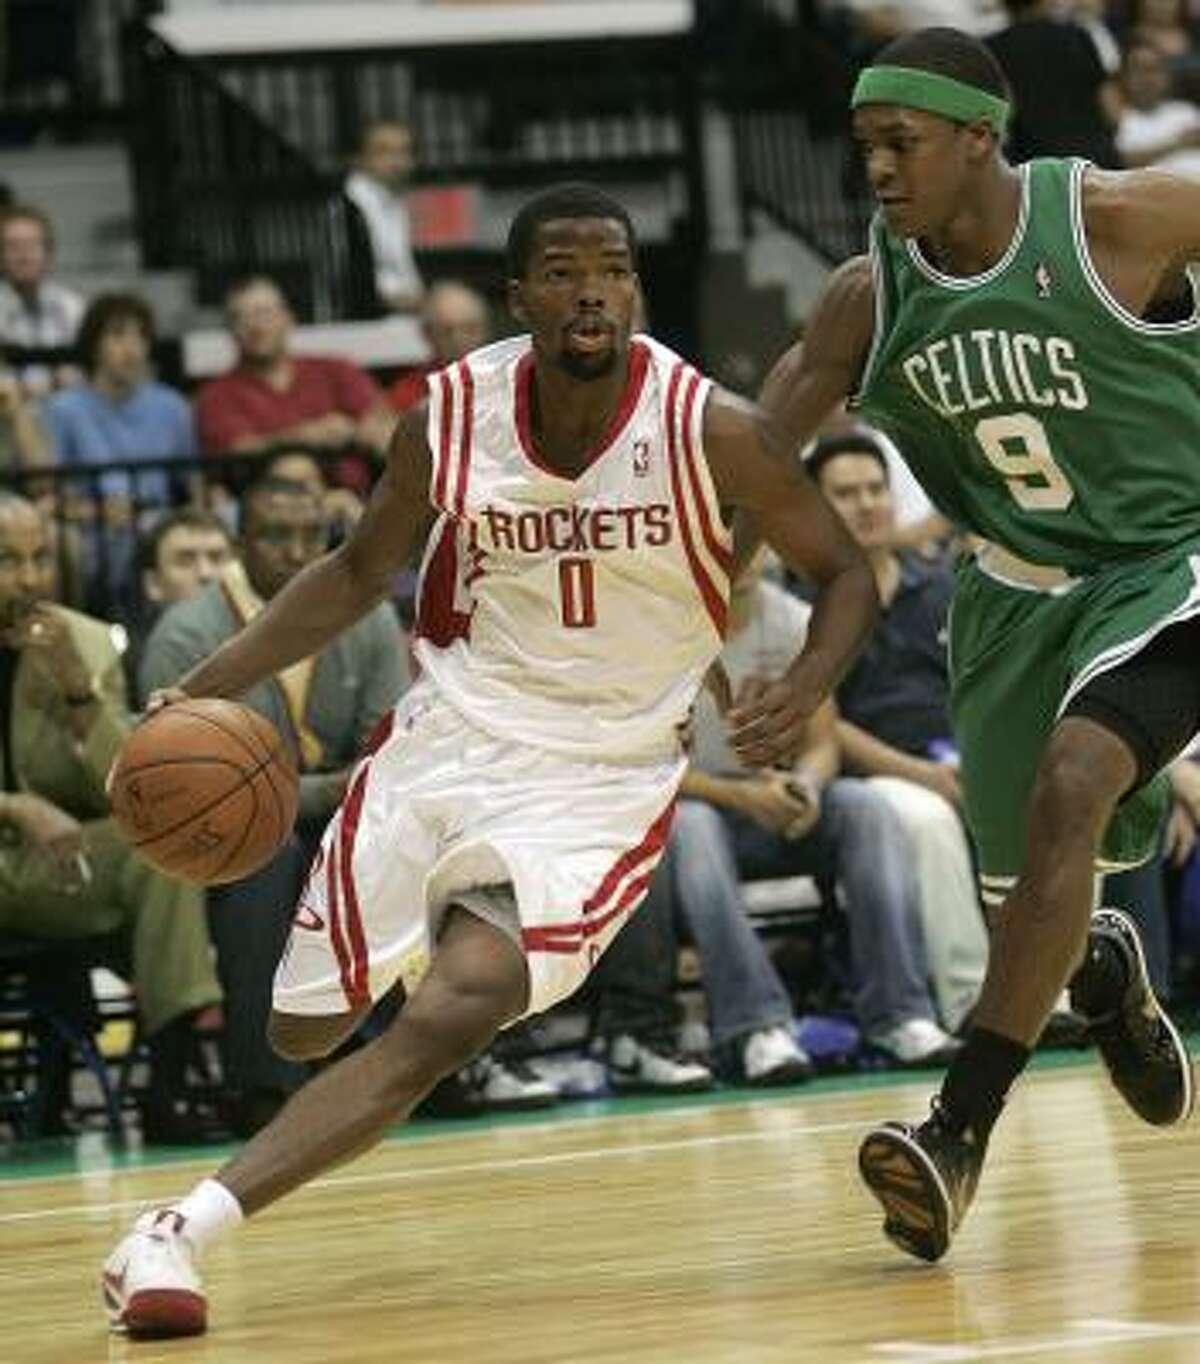 Rockets 96, Celtics 90 Rockets point guard Aaron Brooks drives against Celtics point guard Rajon Rondo during the first quarter.